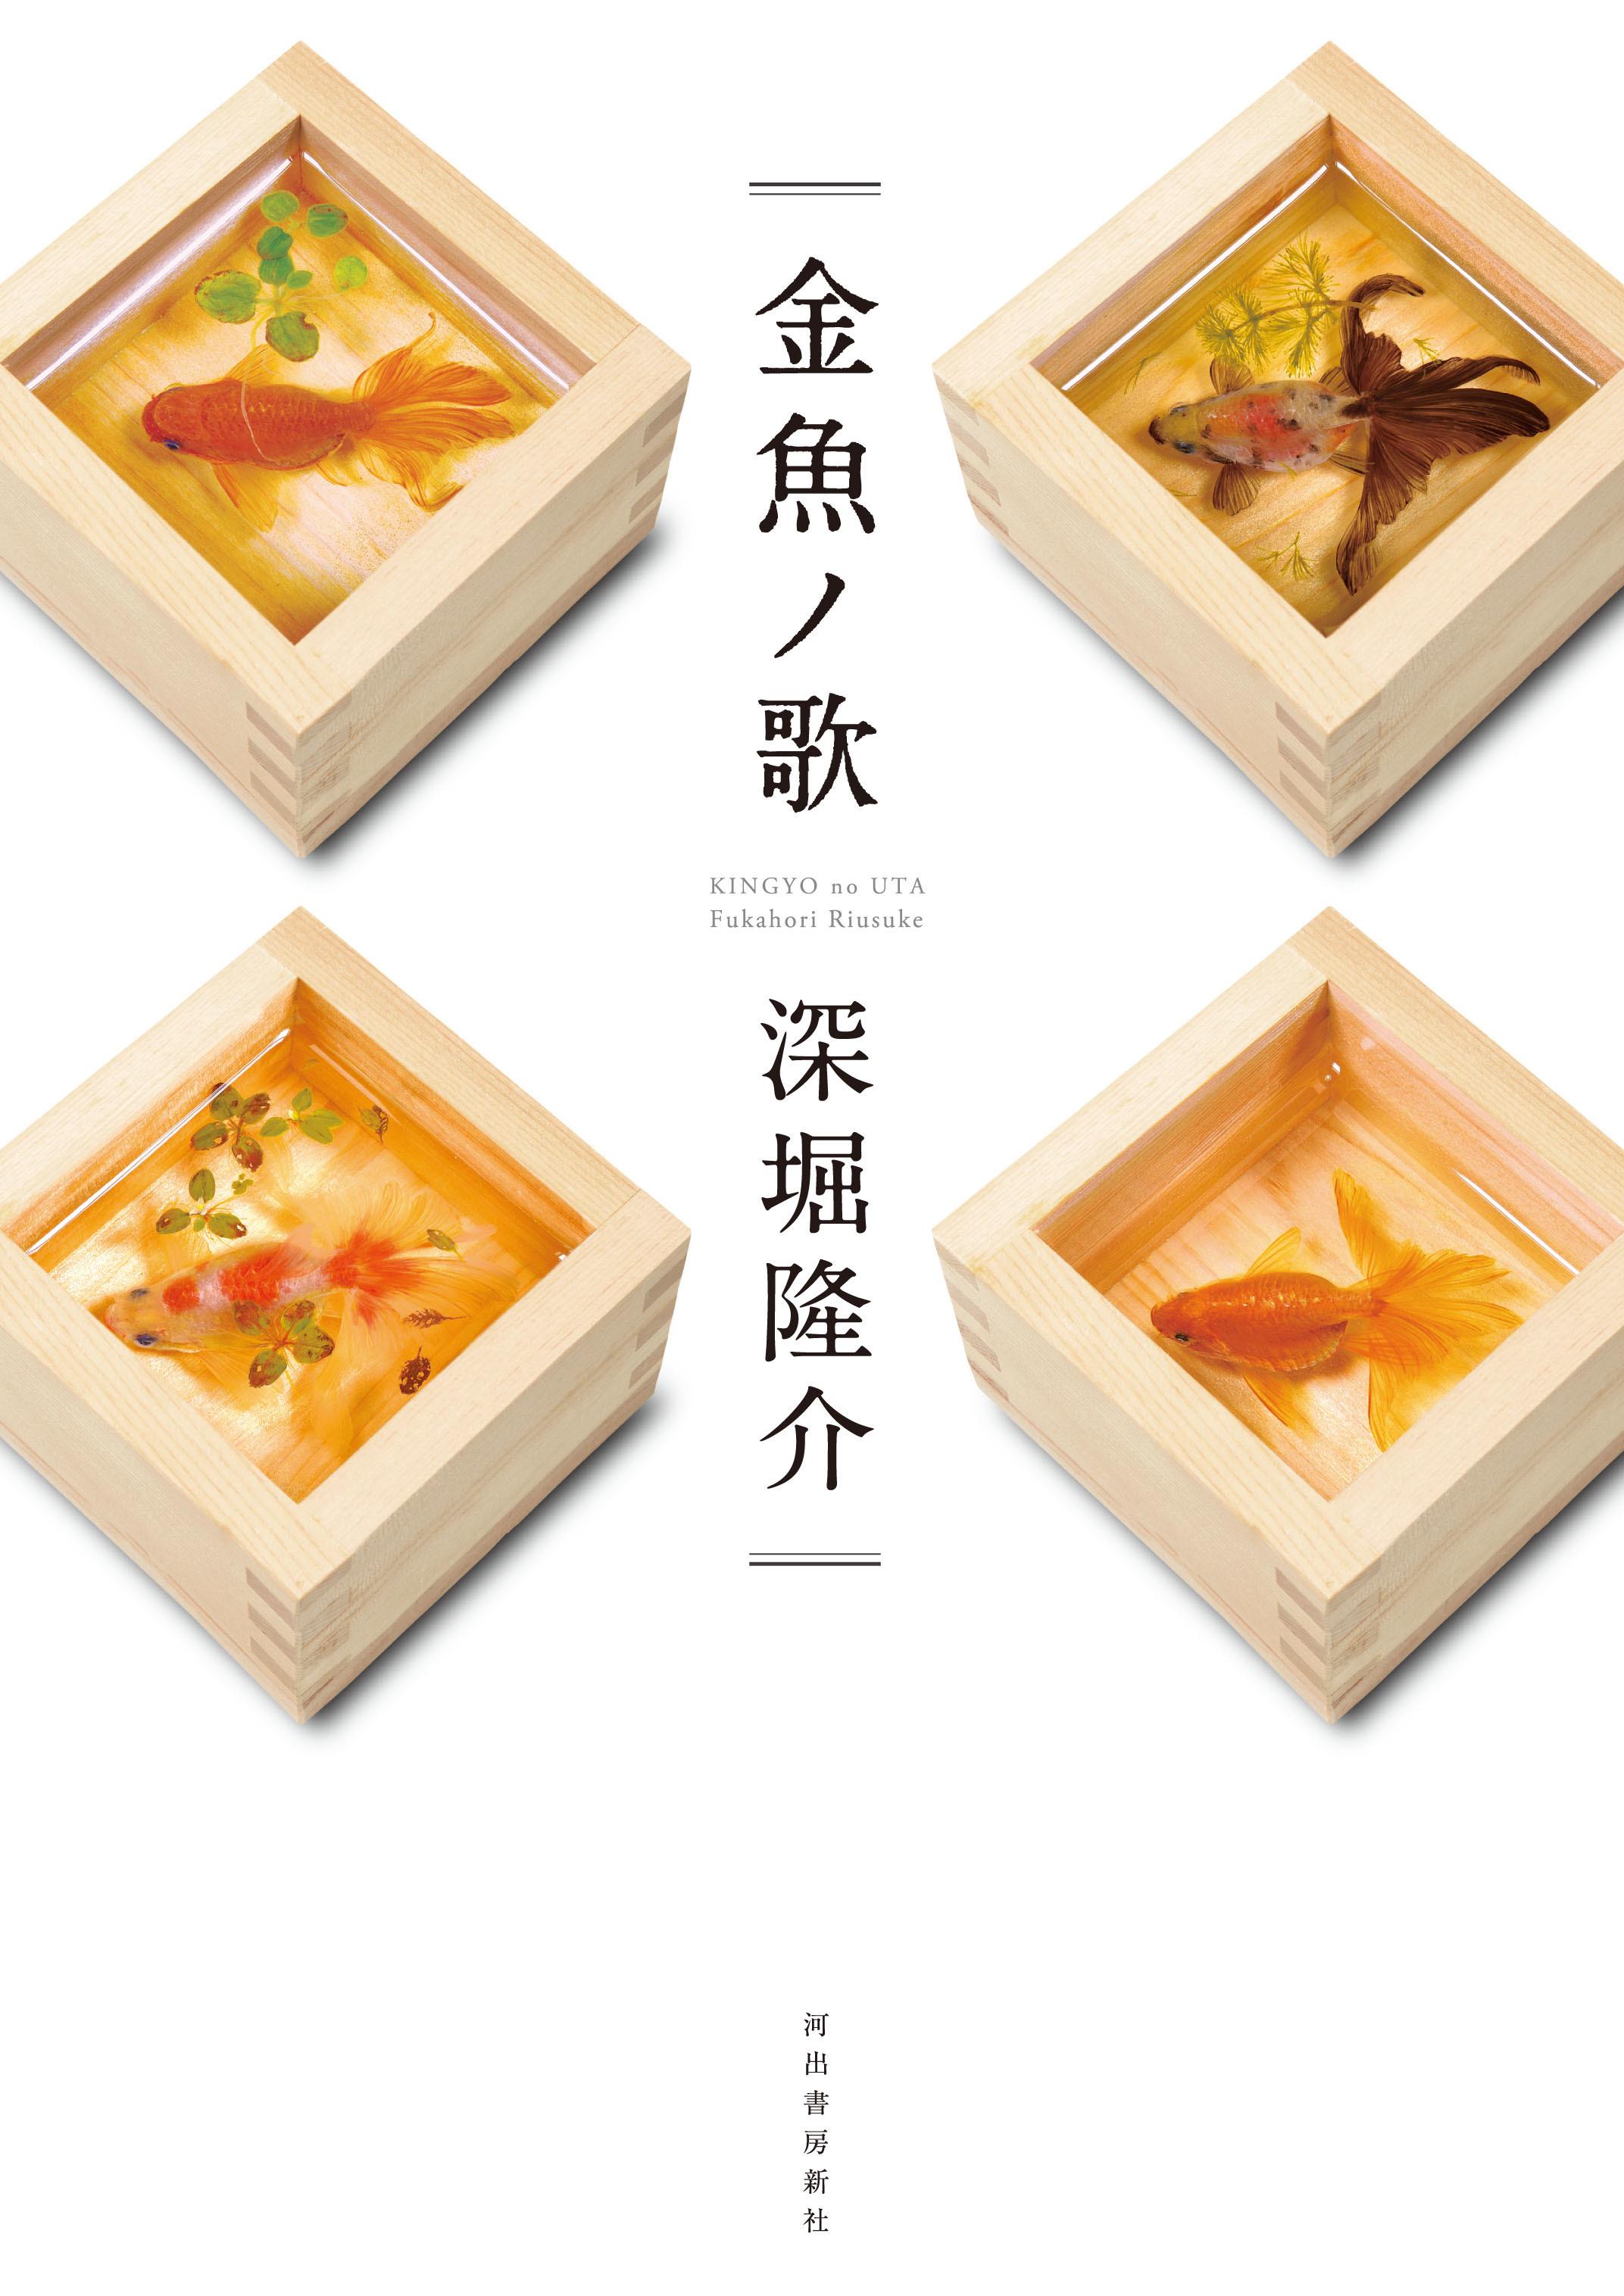 『金魚ノ歌』